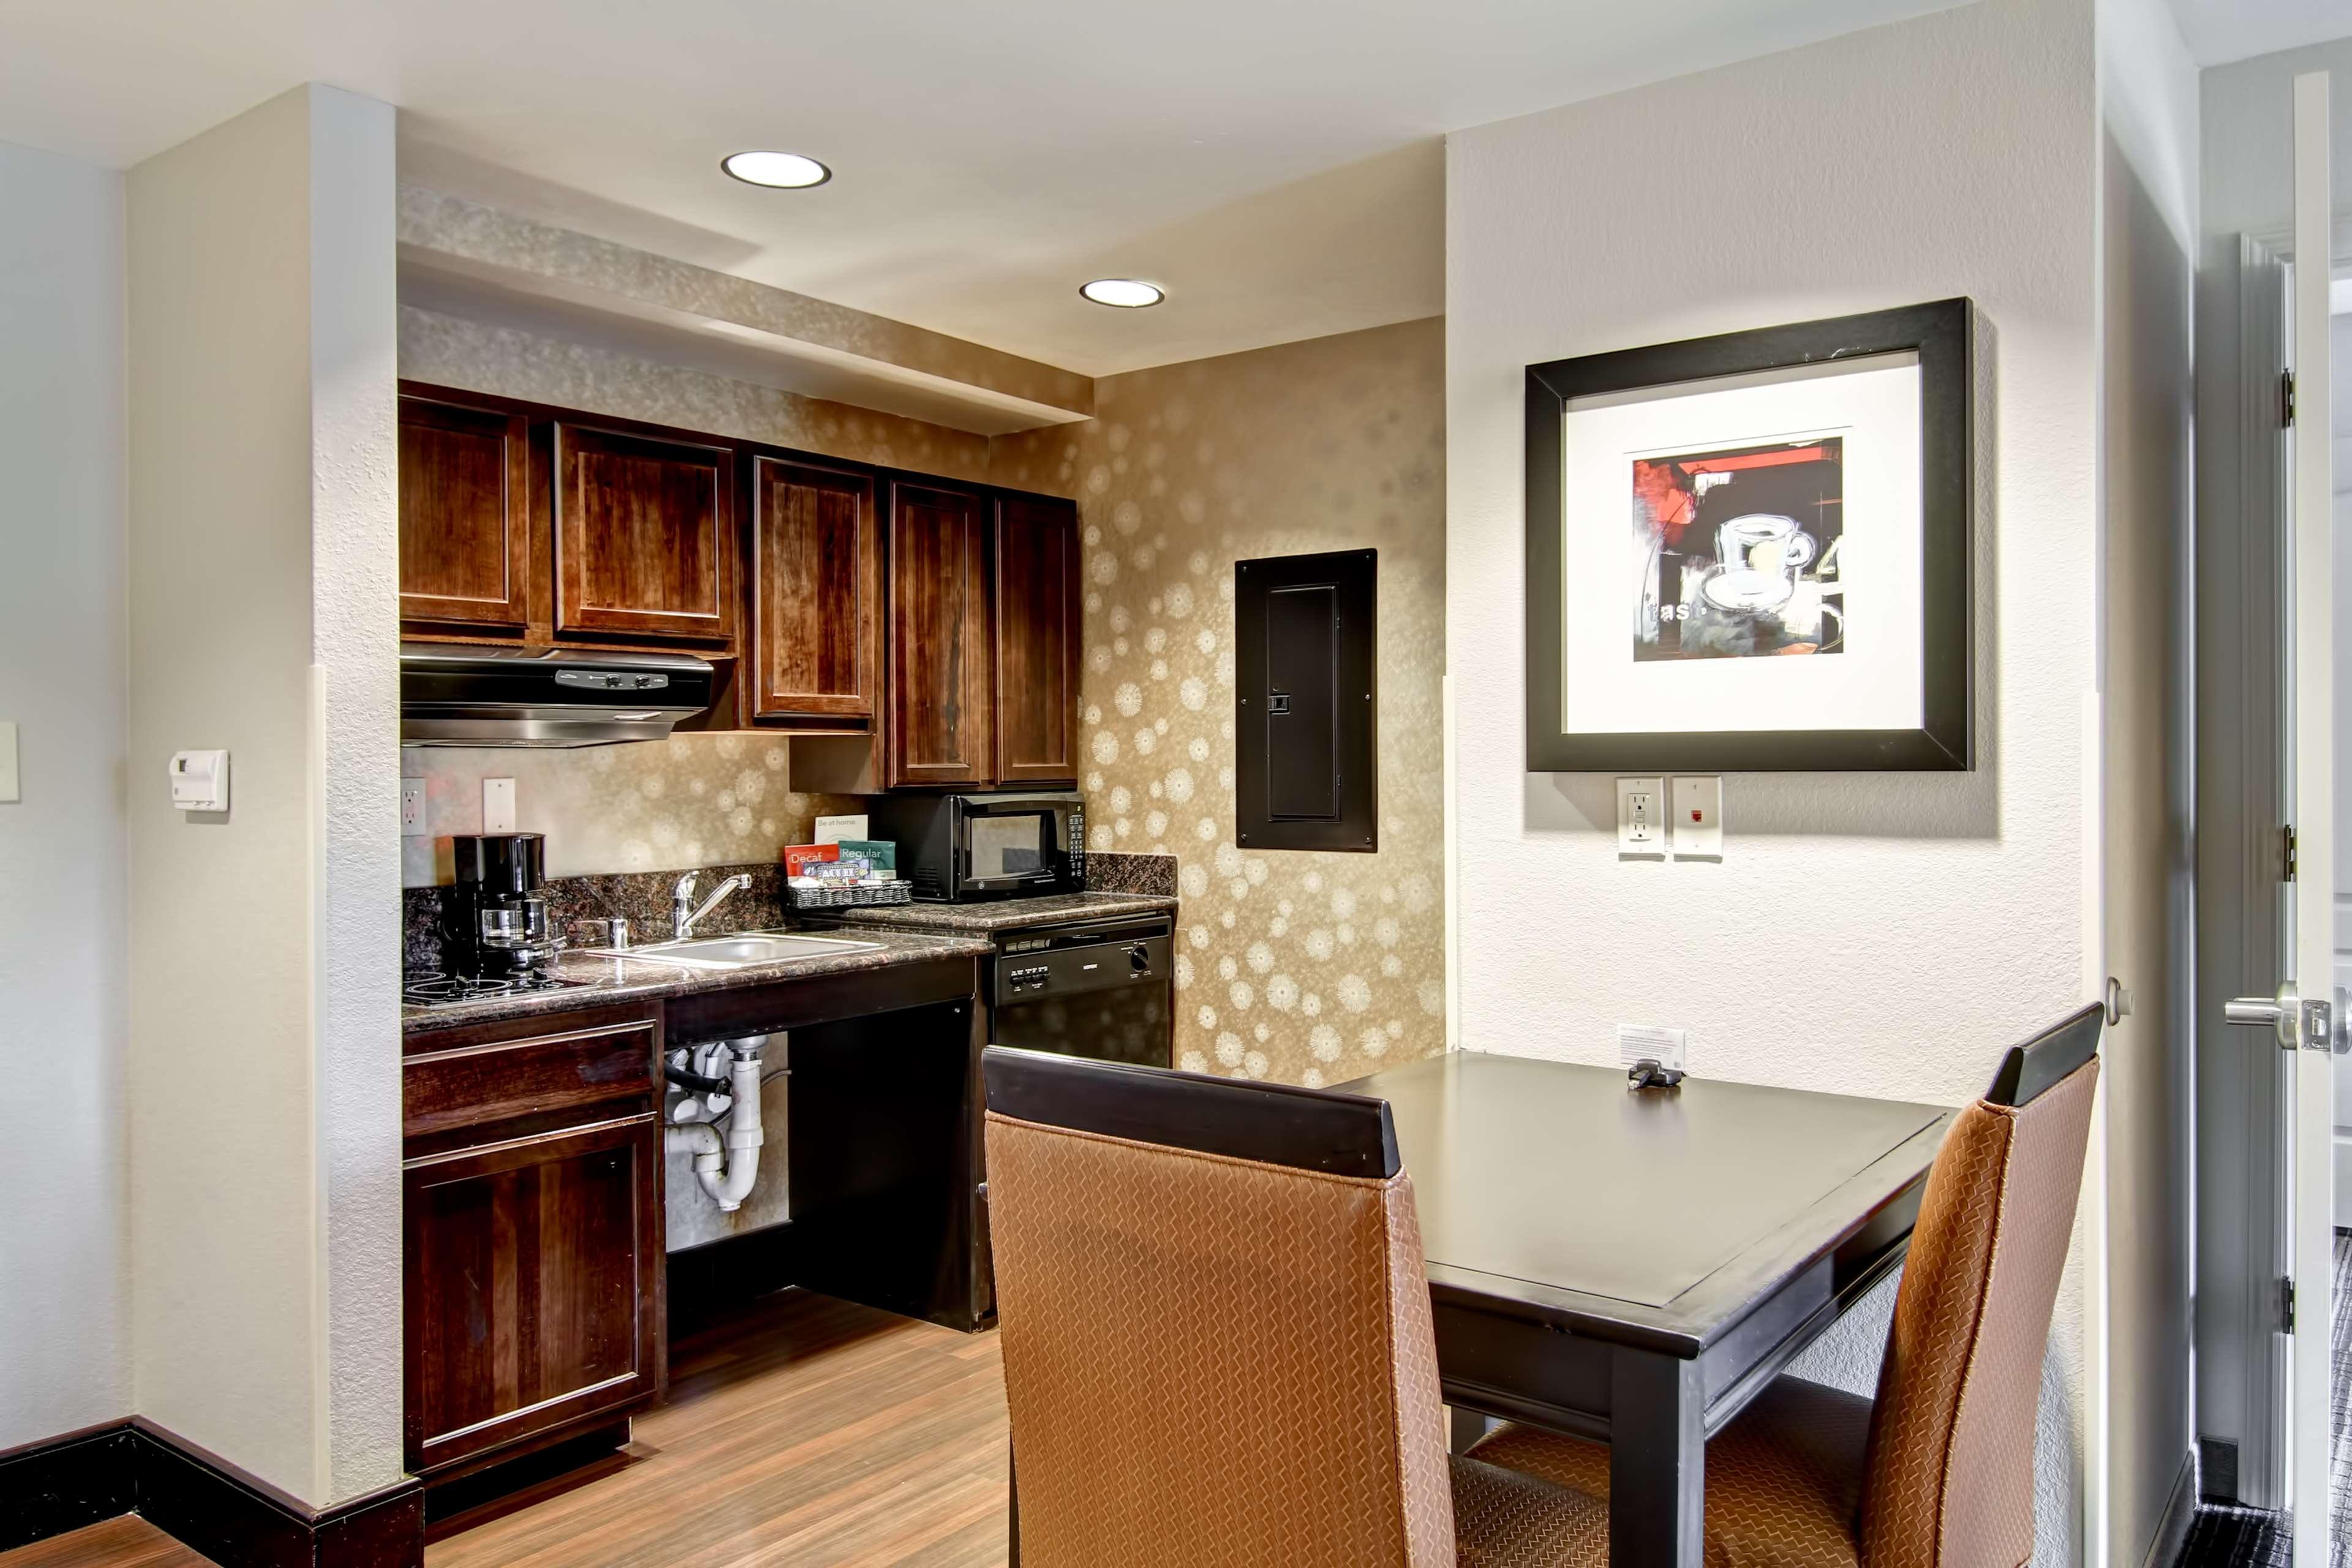 Homewood Suites by Hilton Cincinnati Airport South-Florence image 34